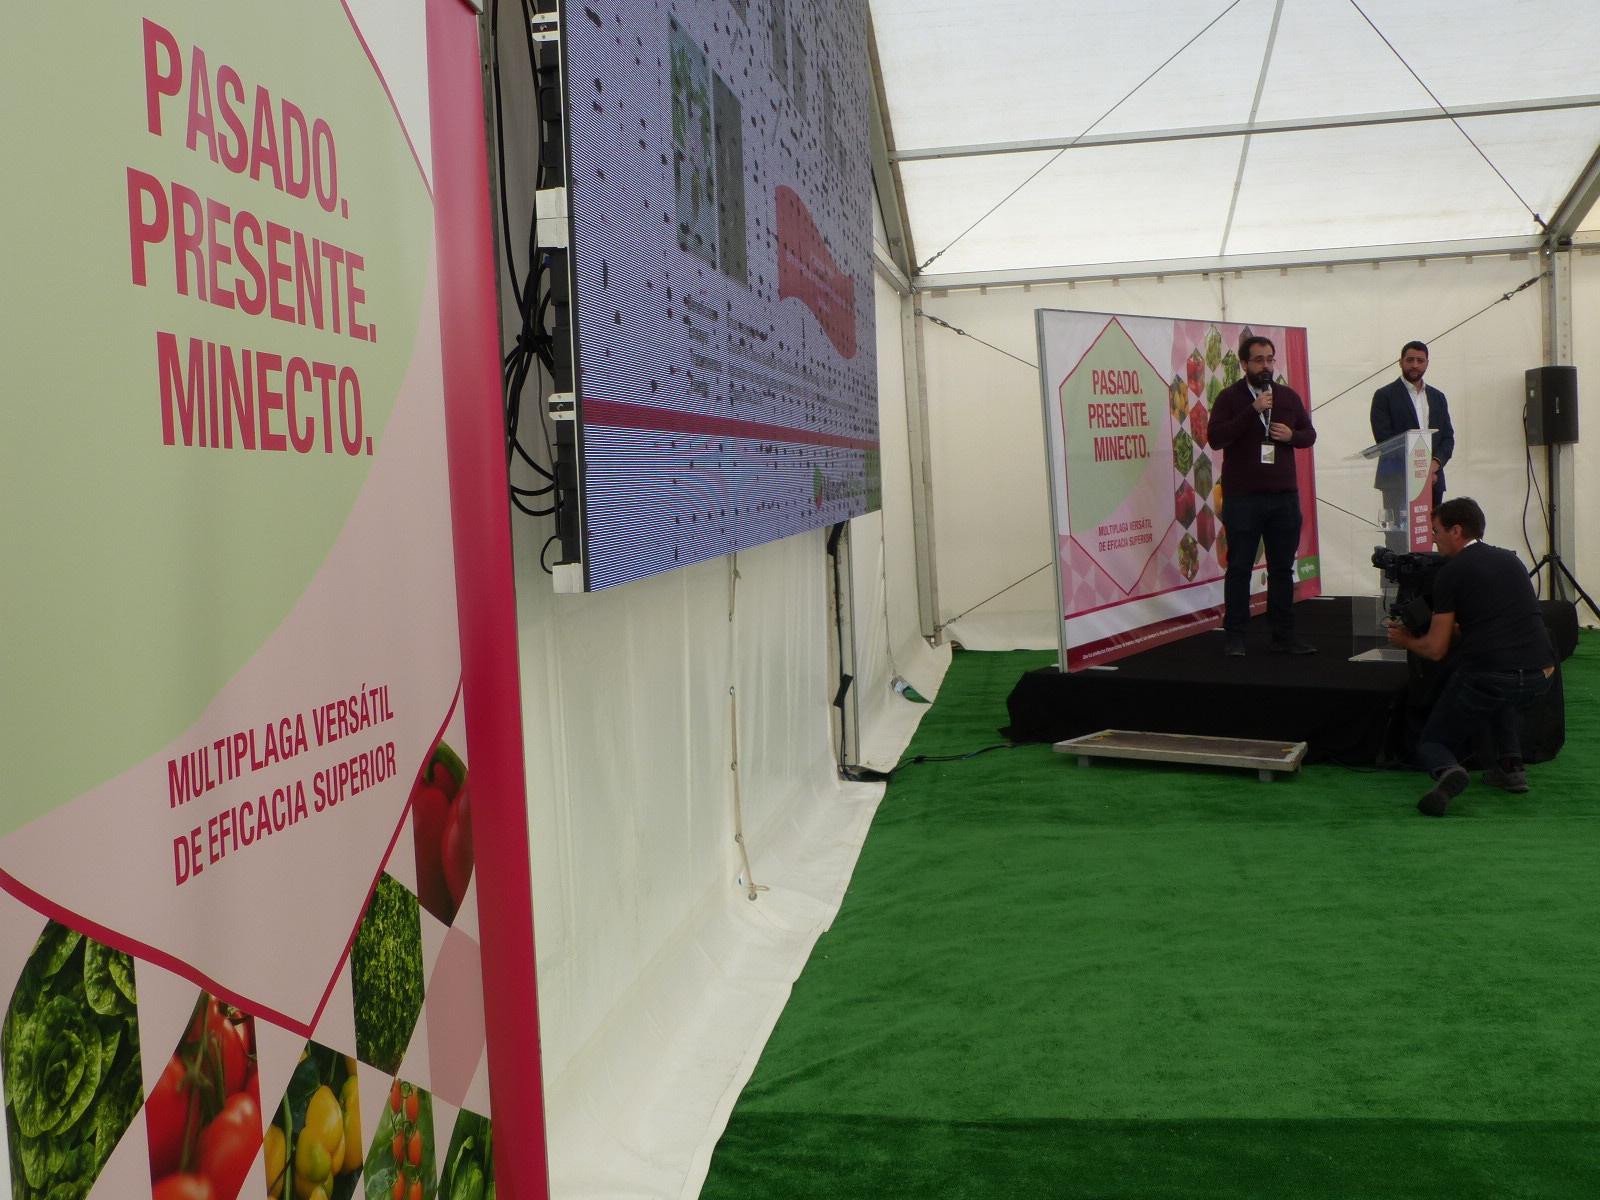 MINECTO ALPHA SYNGENTA Presentación en Mazarrón